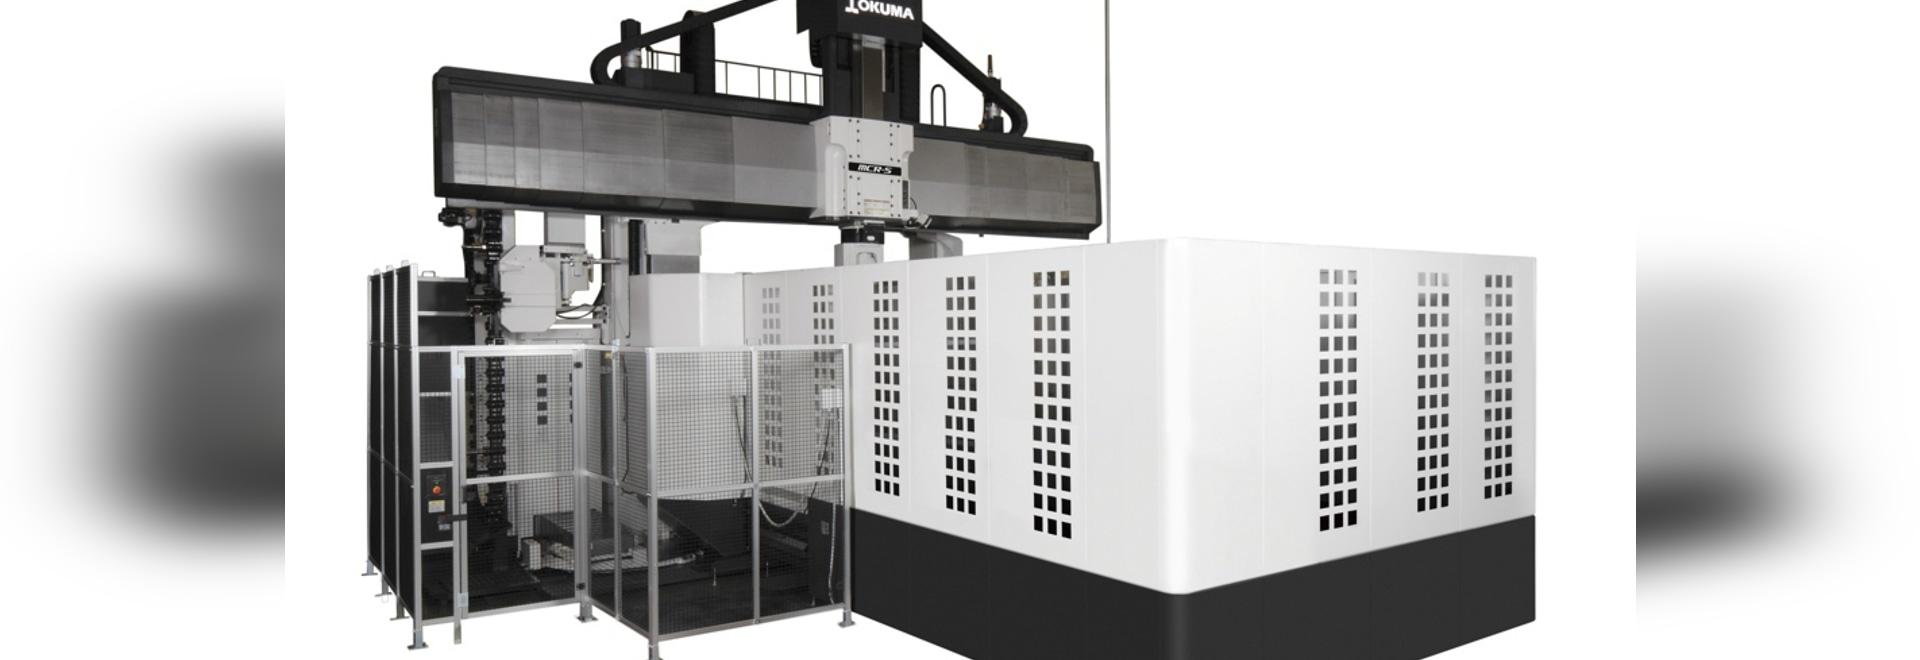 Okuma unveils new double column machining centre